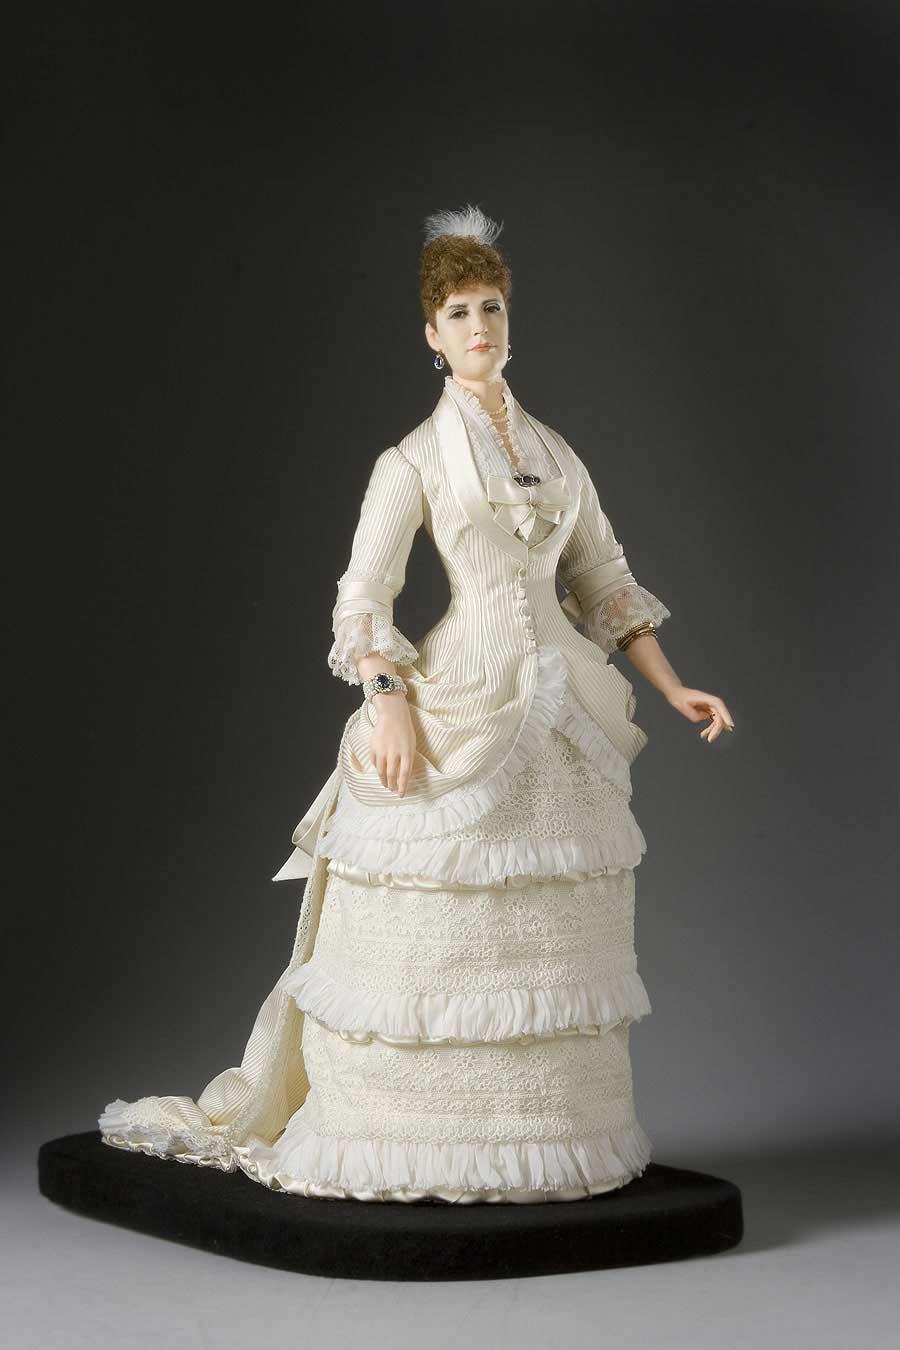 Full length color image of Empress Marie Feodorovna aka. Dagmar of Denmark, by George Stuart.